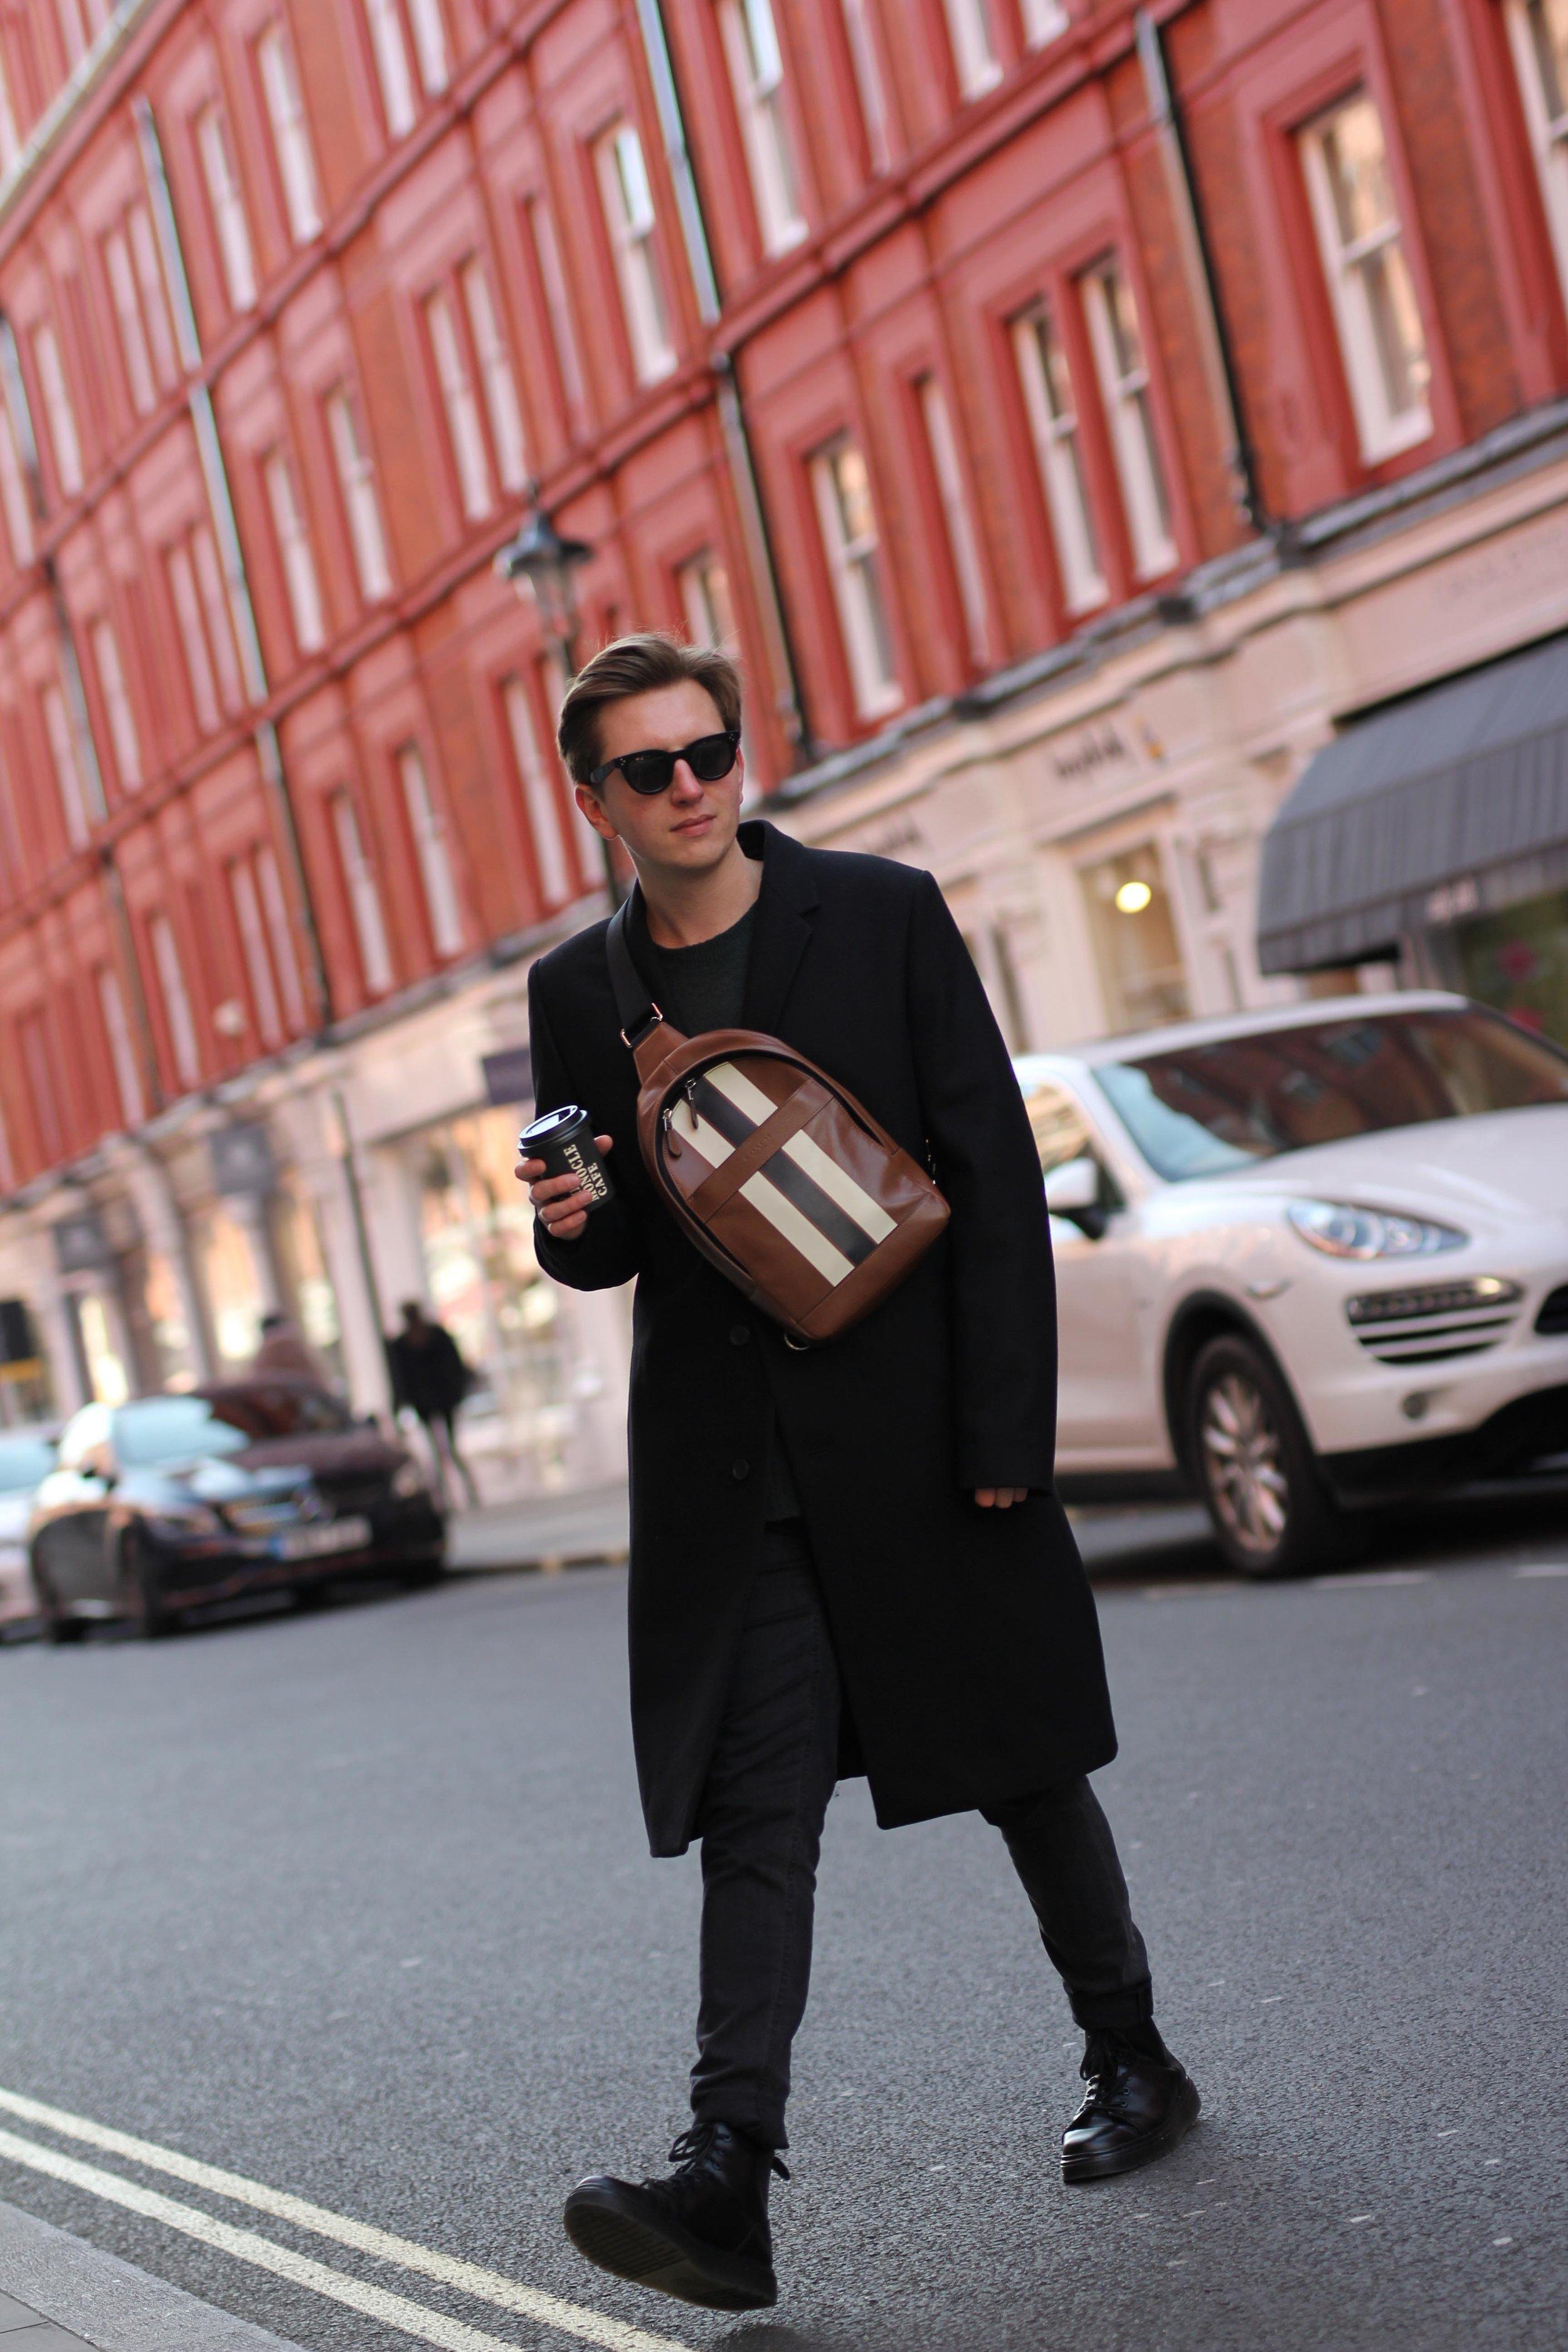 london_menswear_rolandas_lusinskis_celine_acne_studios_marylebone_monocle_joseph_coach